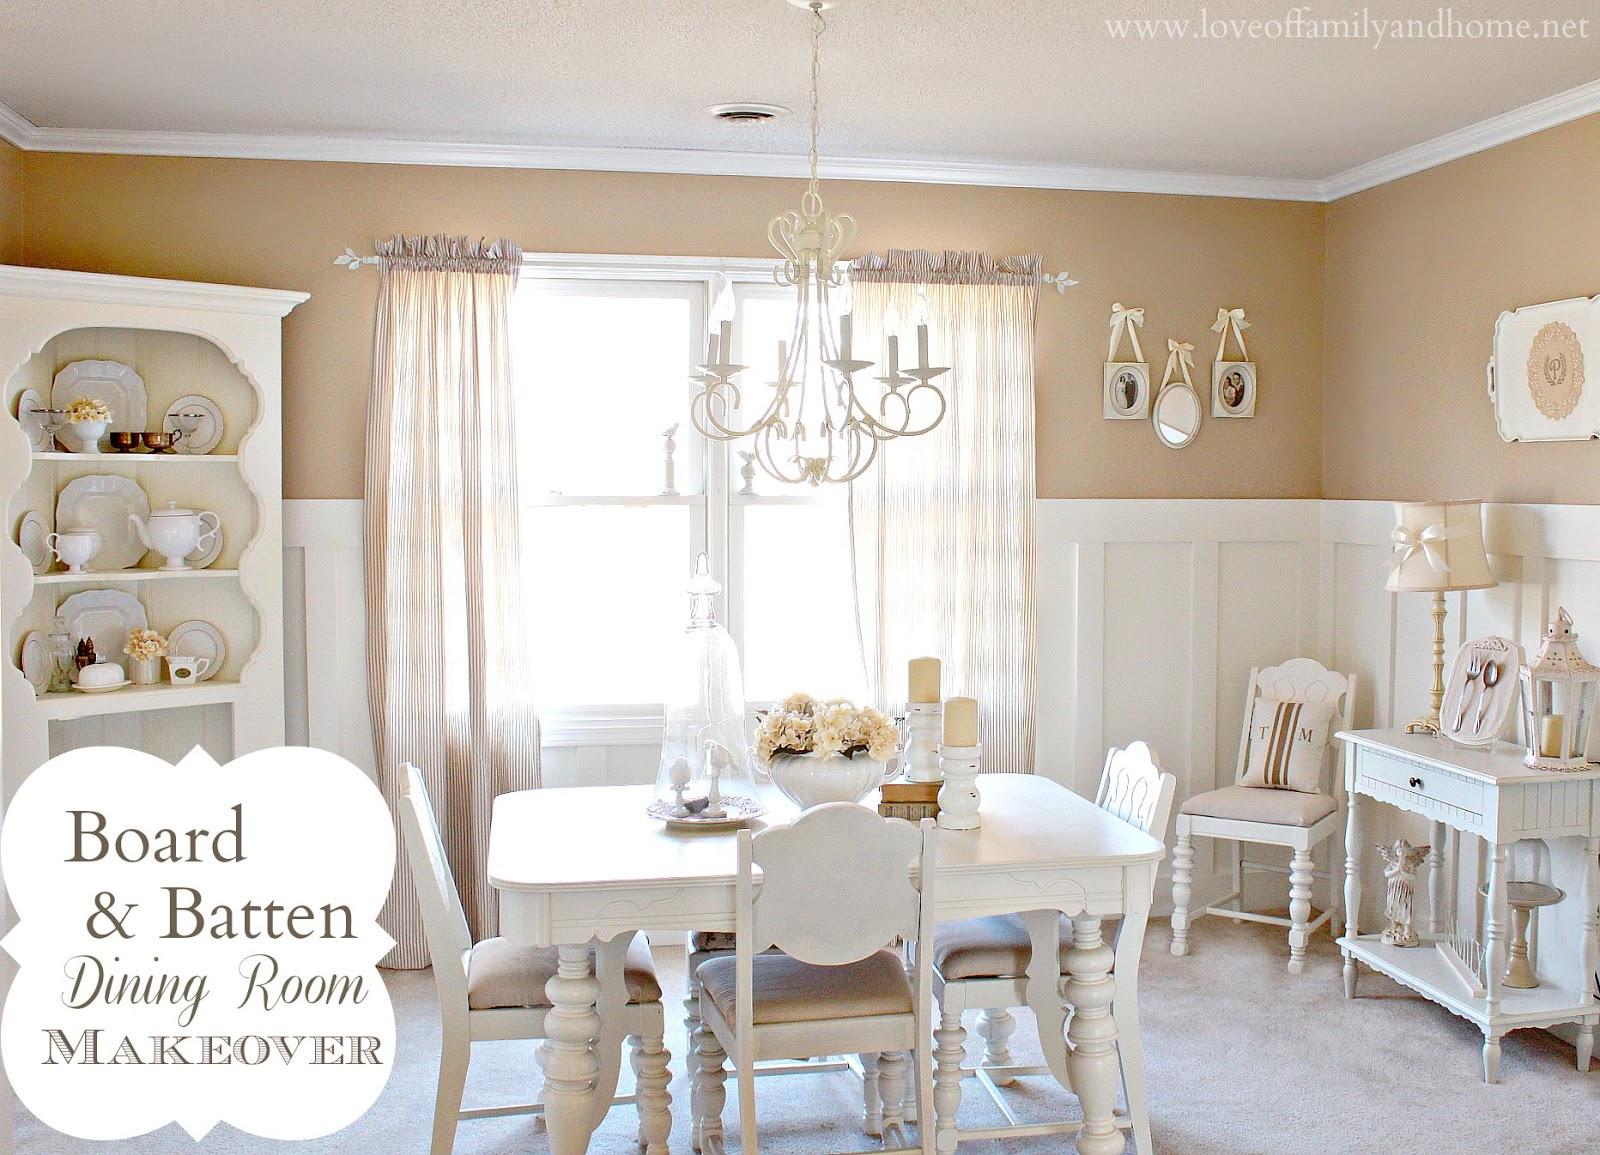 dining room makeover board batten dining room makeover love of family home